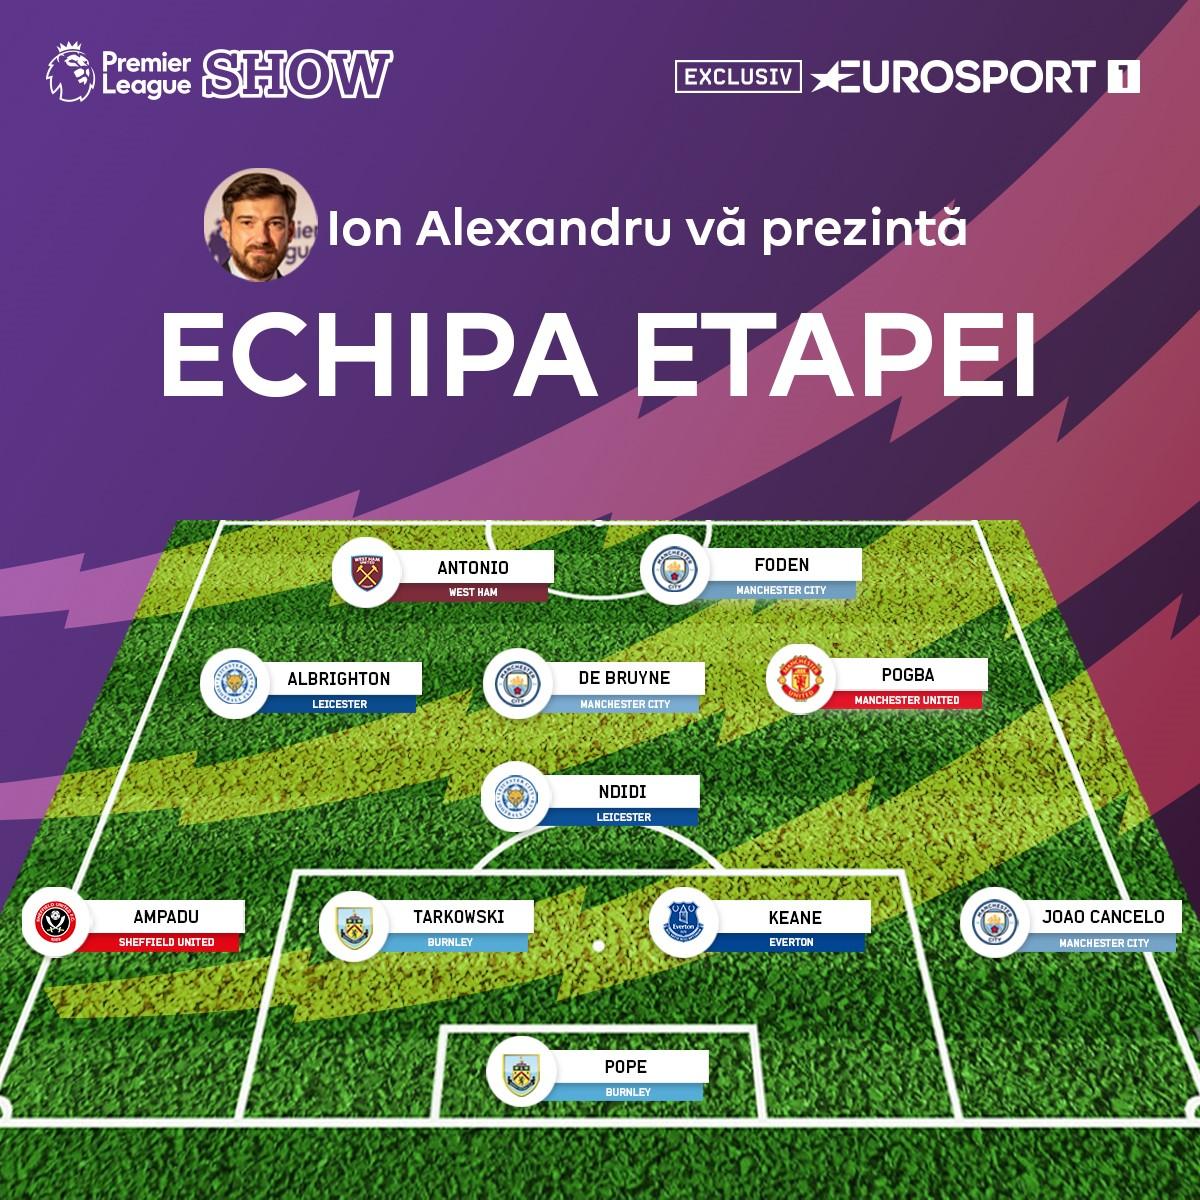 https://i.eurosport.com/2021/01/22/2976219.jpg